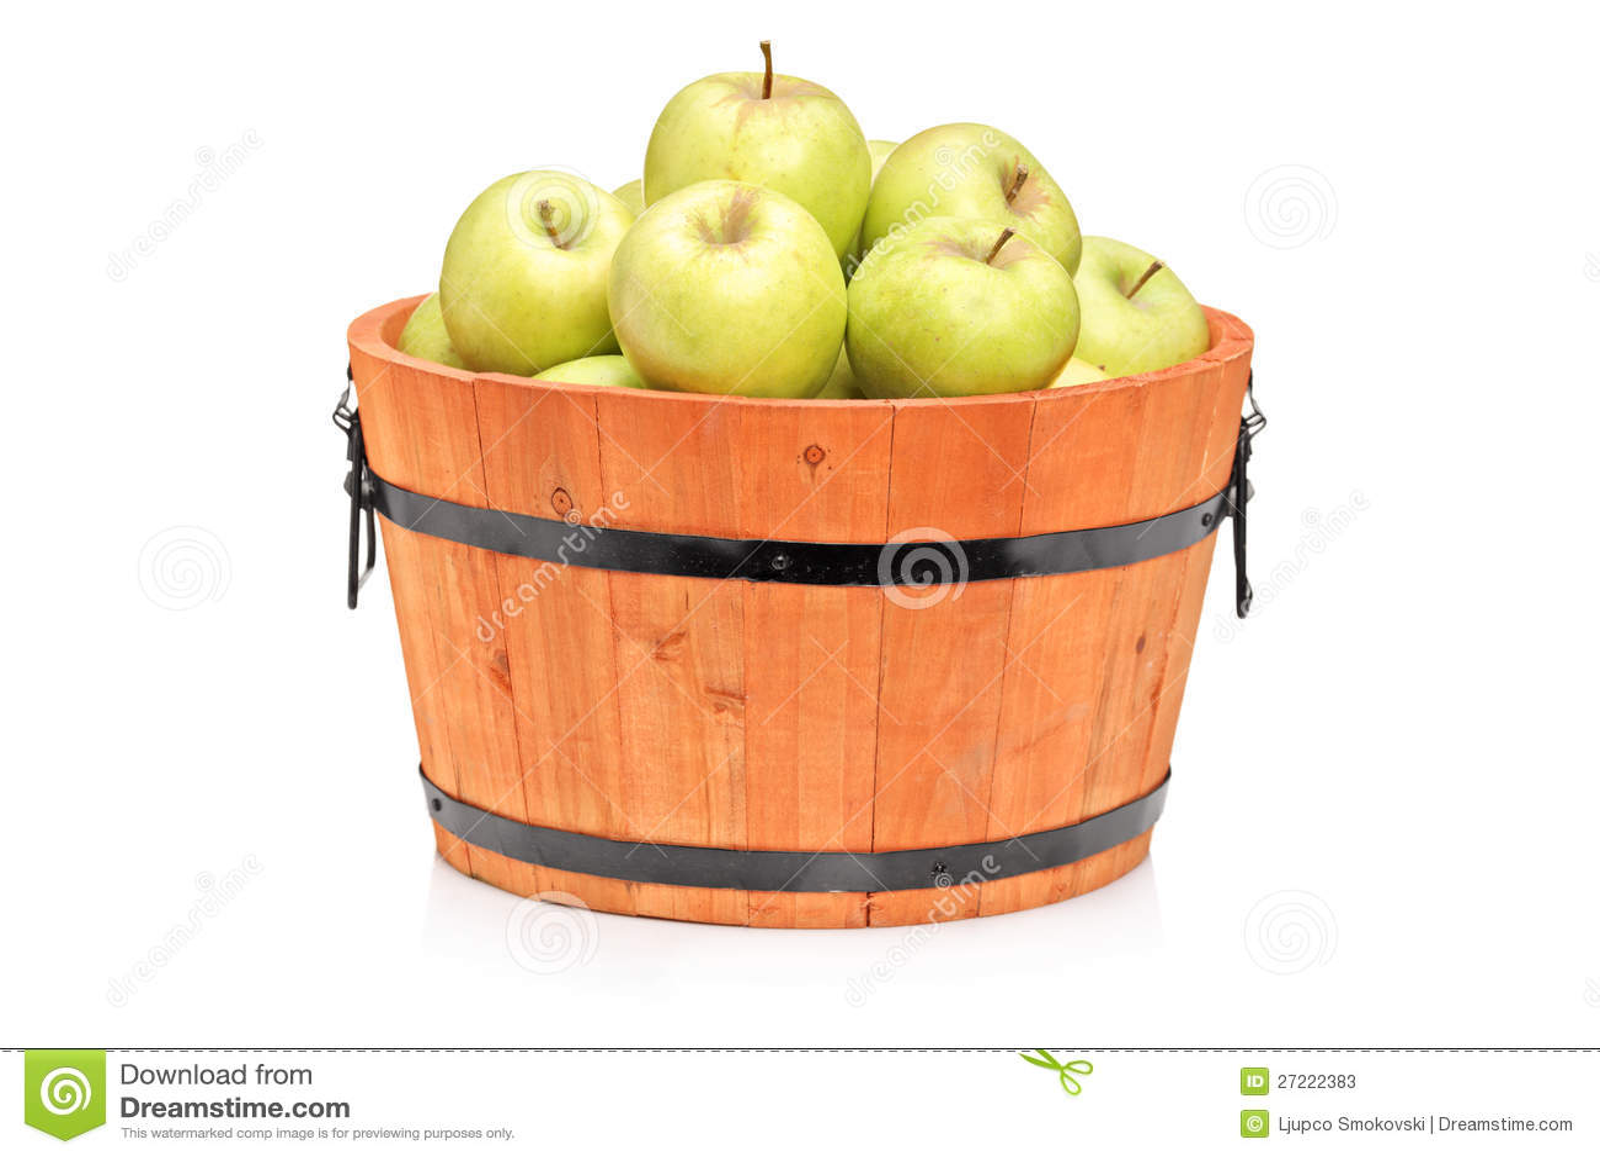 Studio Shot Of Green Apples In A Wooden Barrel Stock Photos - Image: 27222383